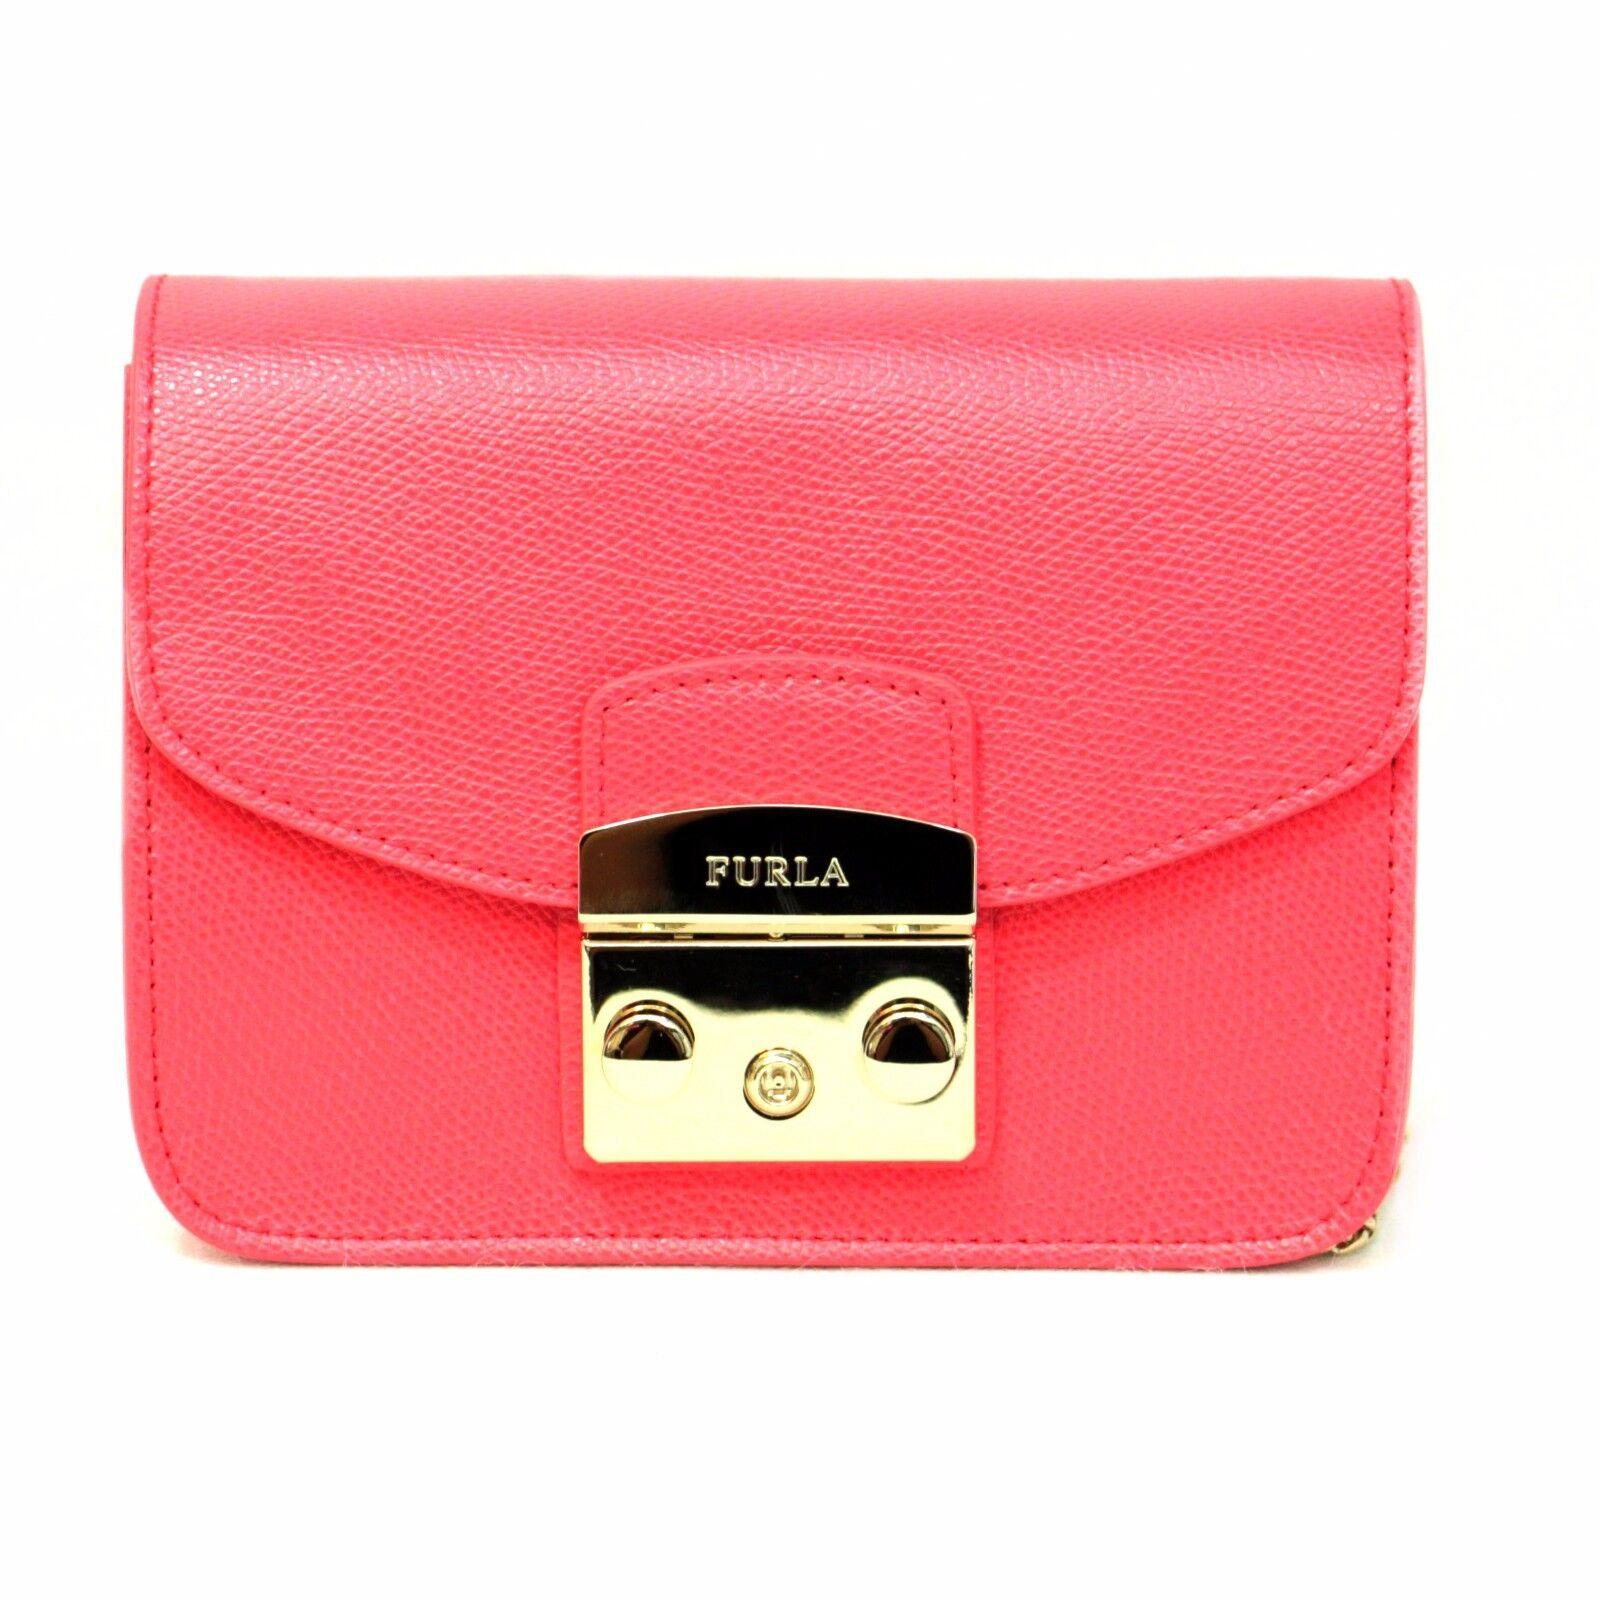 Pink leather Metropolis bag Furla DHB14ZYW